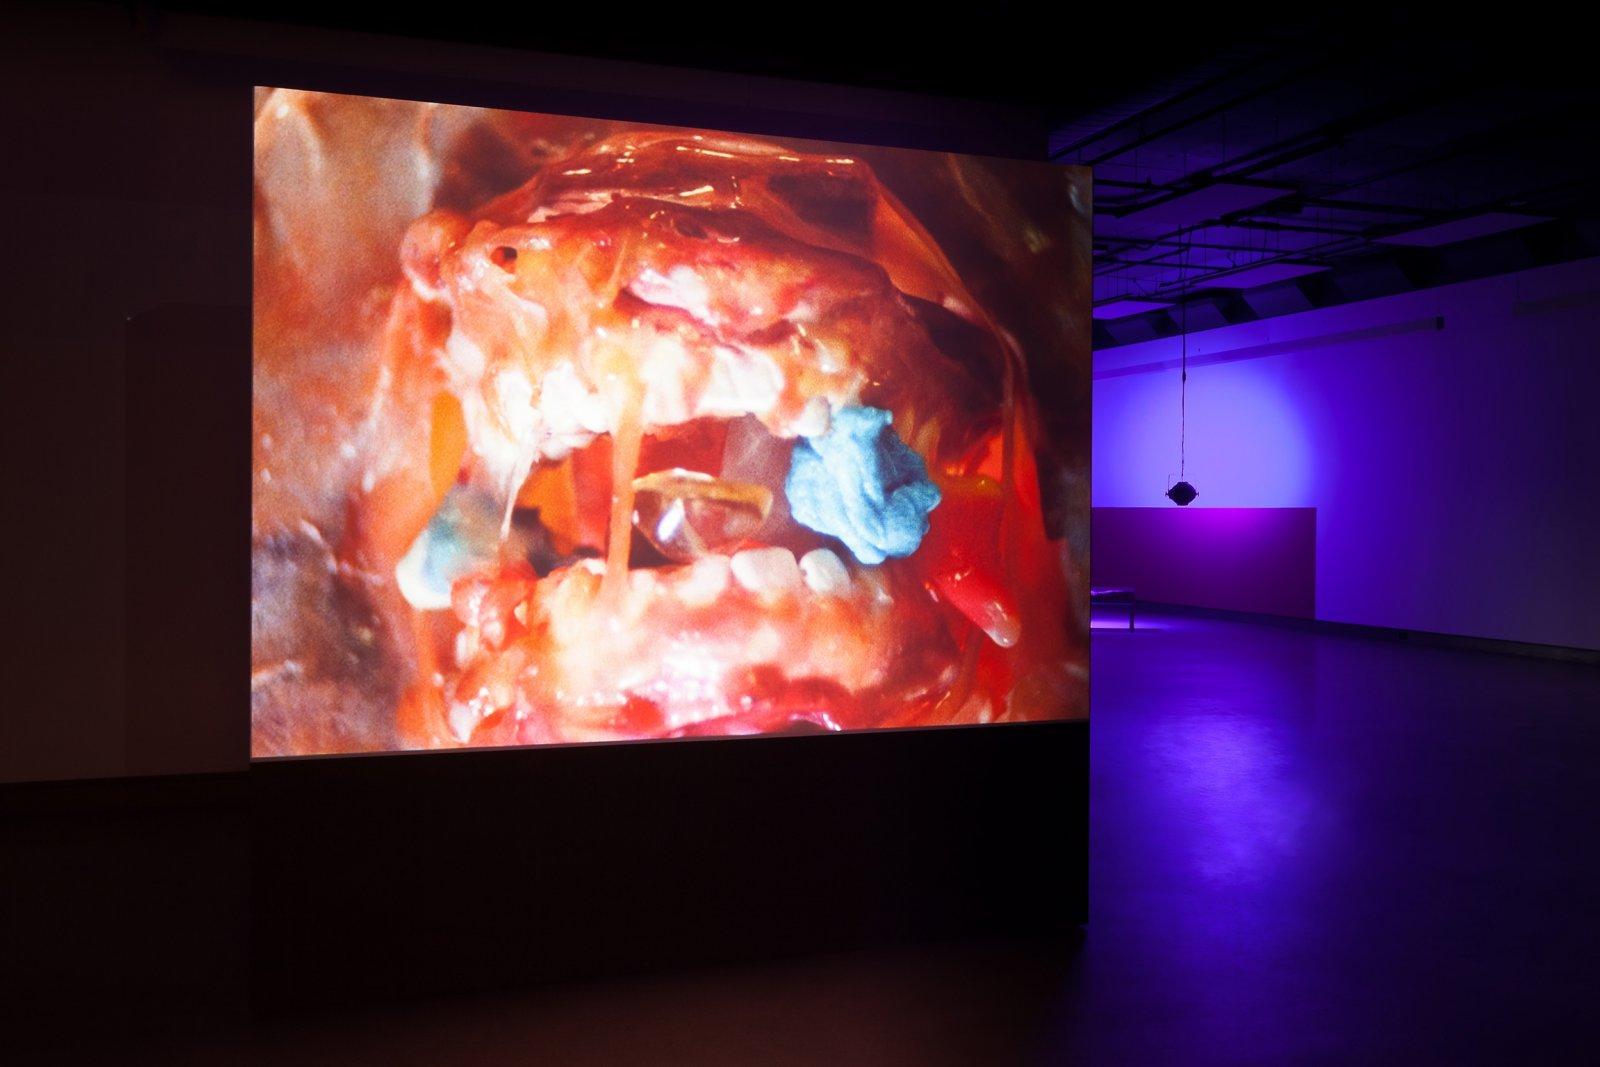 Julia Feyrer, New Pedestrians, 2018, 16mm film transferred to digital with sound, 4 minutes. Installation view, New Pedestrians, Dazibao, Montreal, Canada, 2019